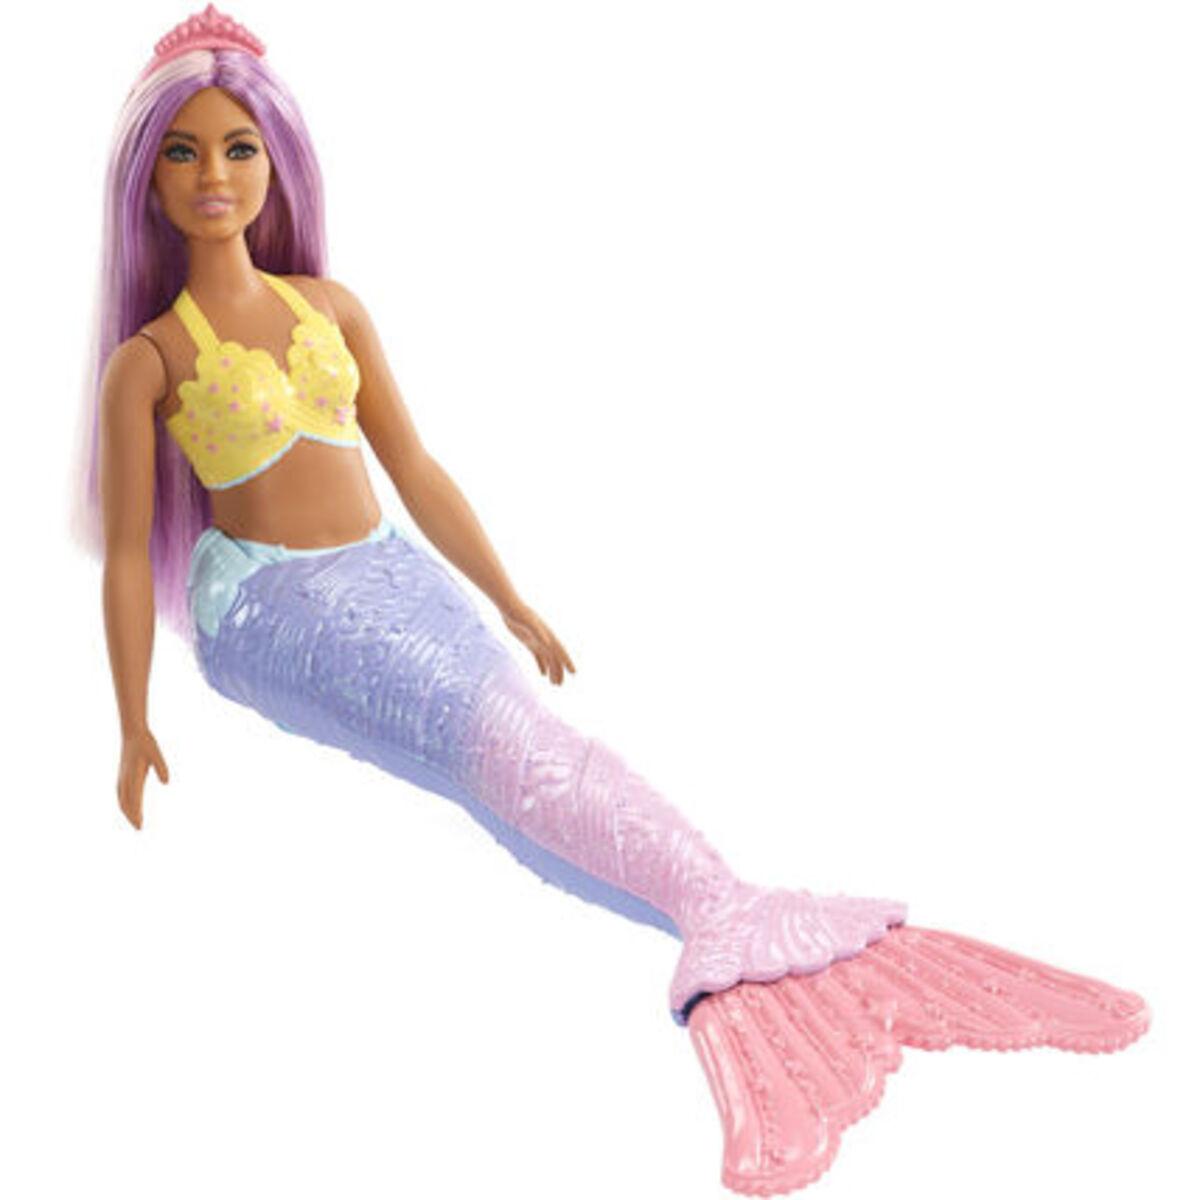 Bild 4 von Barbie Dreamtopia Meerjungfrau, lila Haare